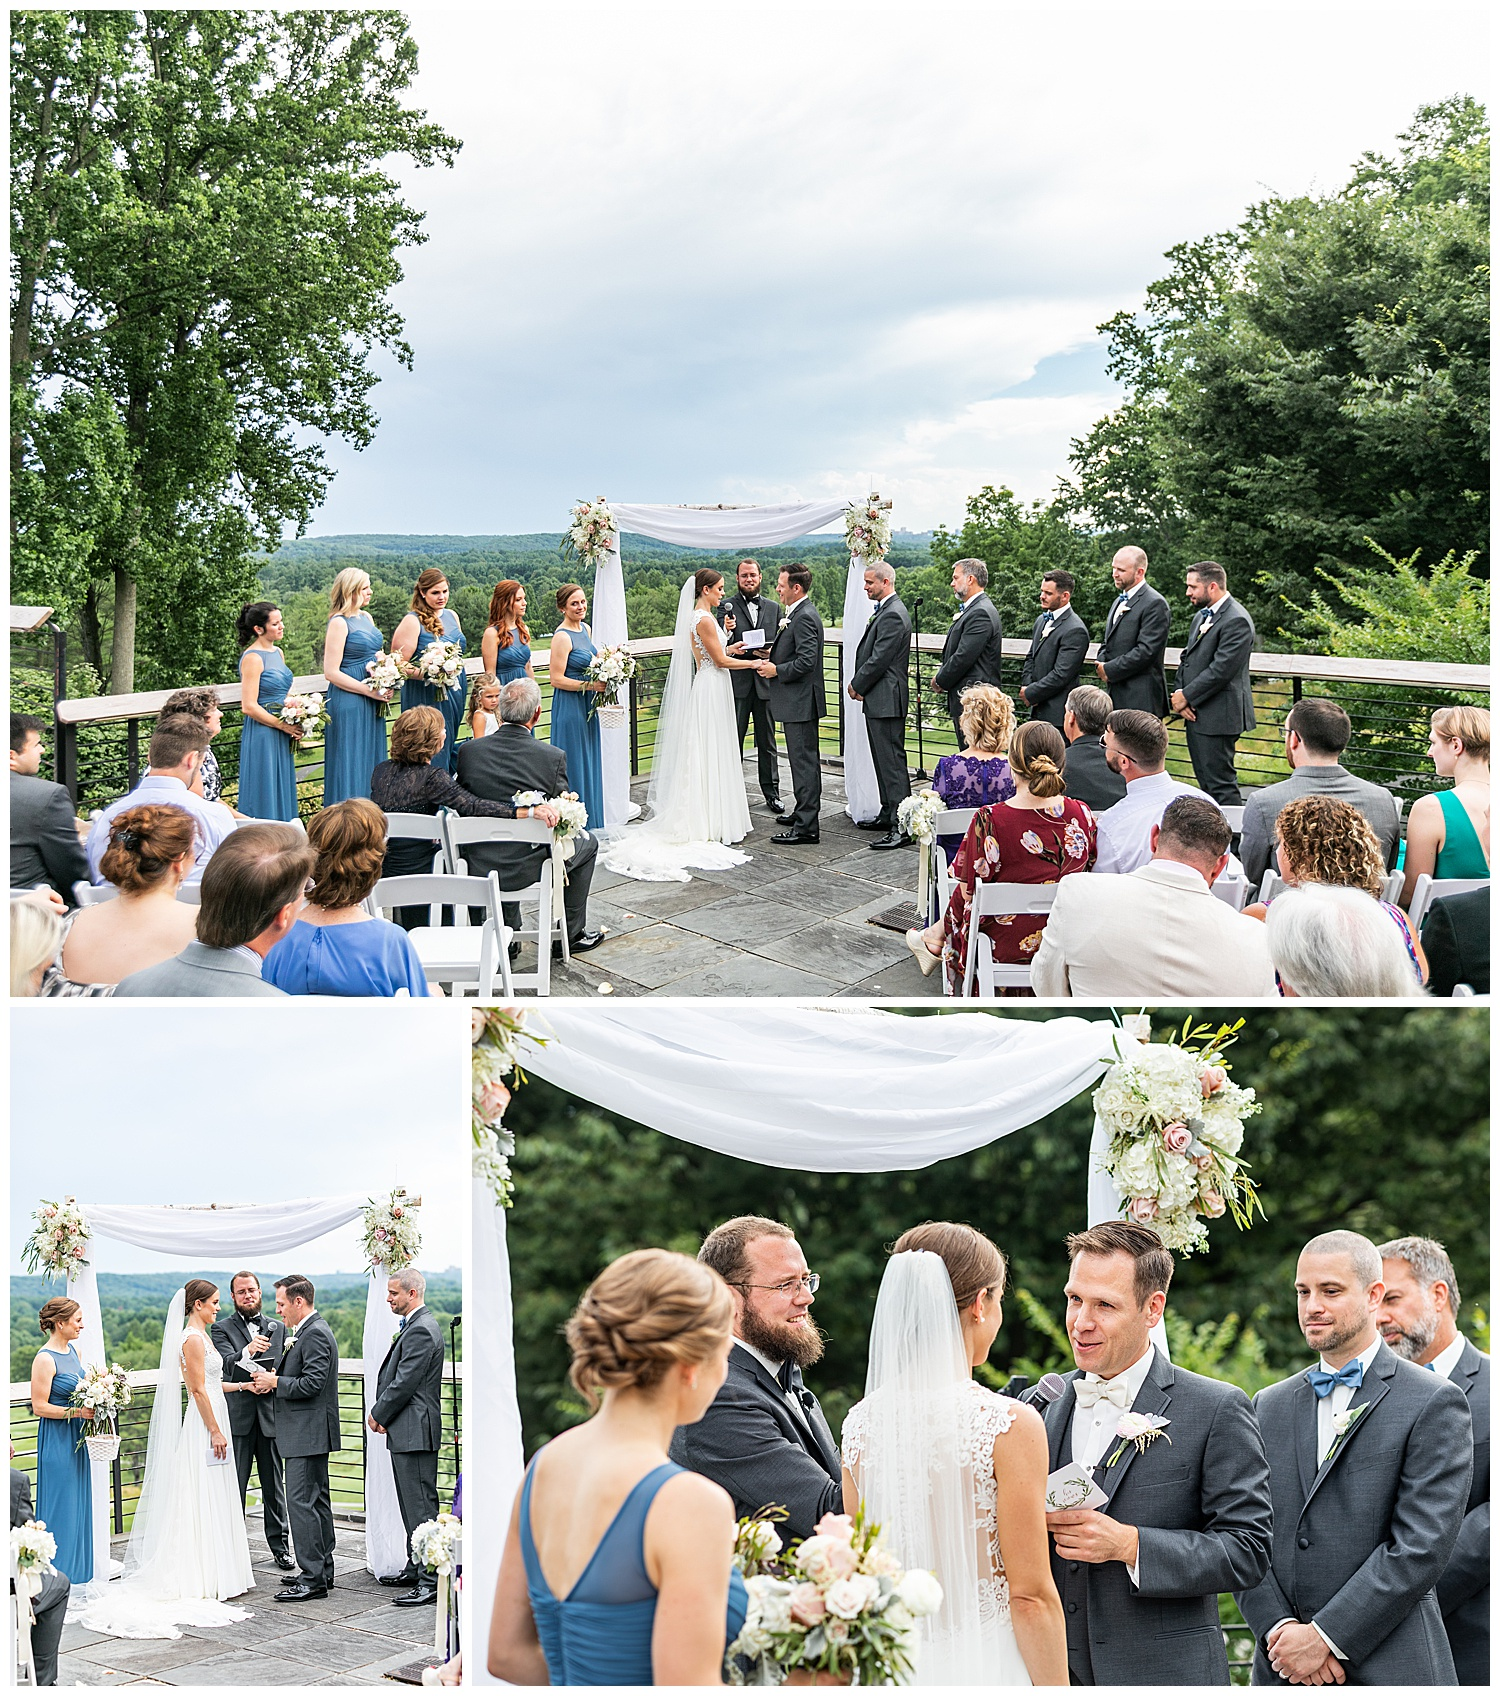 Lindsay Josh Eagles Nest Country Club Wedding Living Radiant Photography photos_0049.jpg